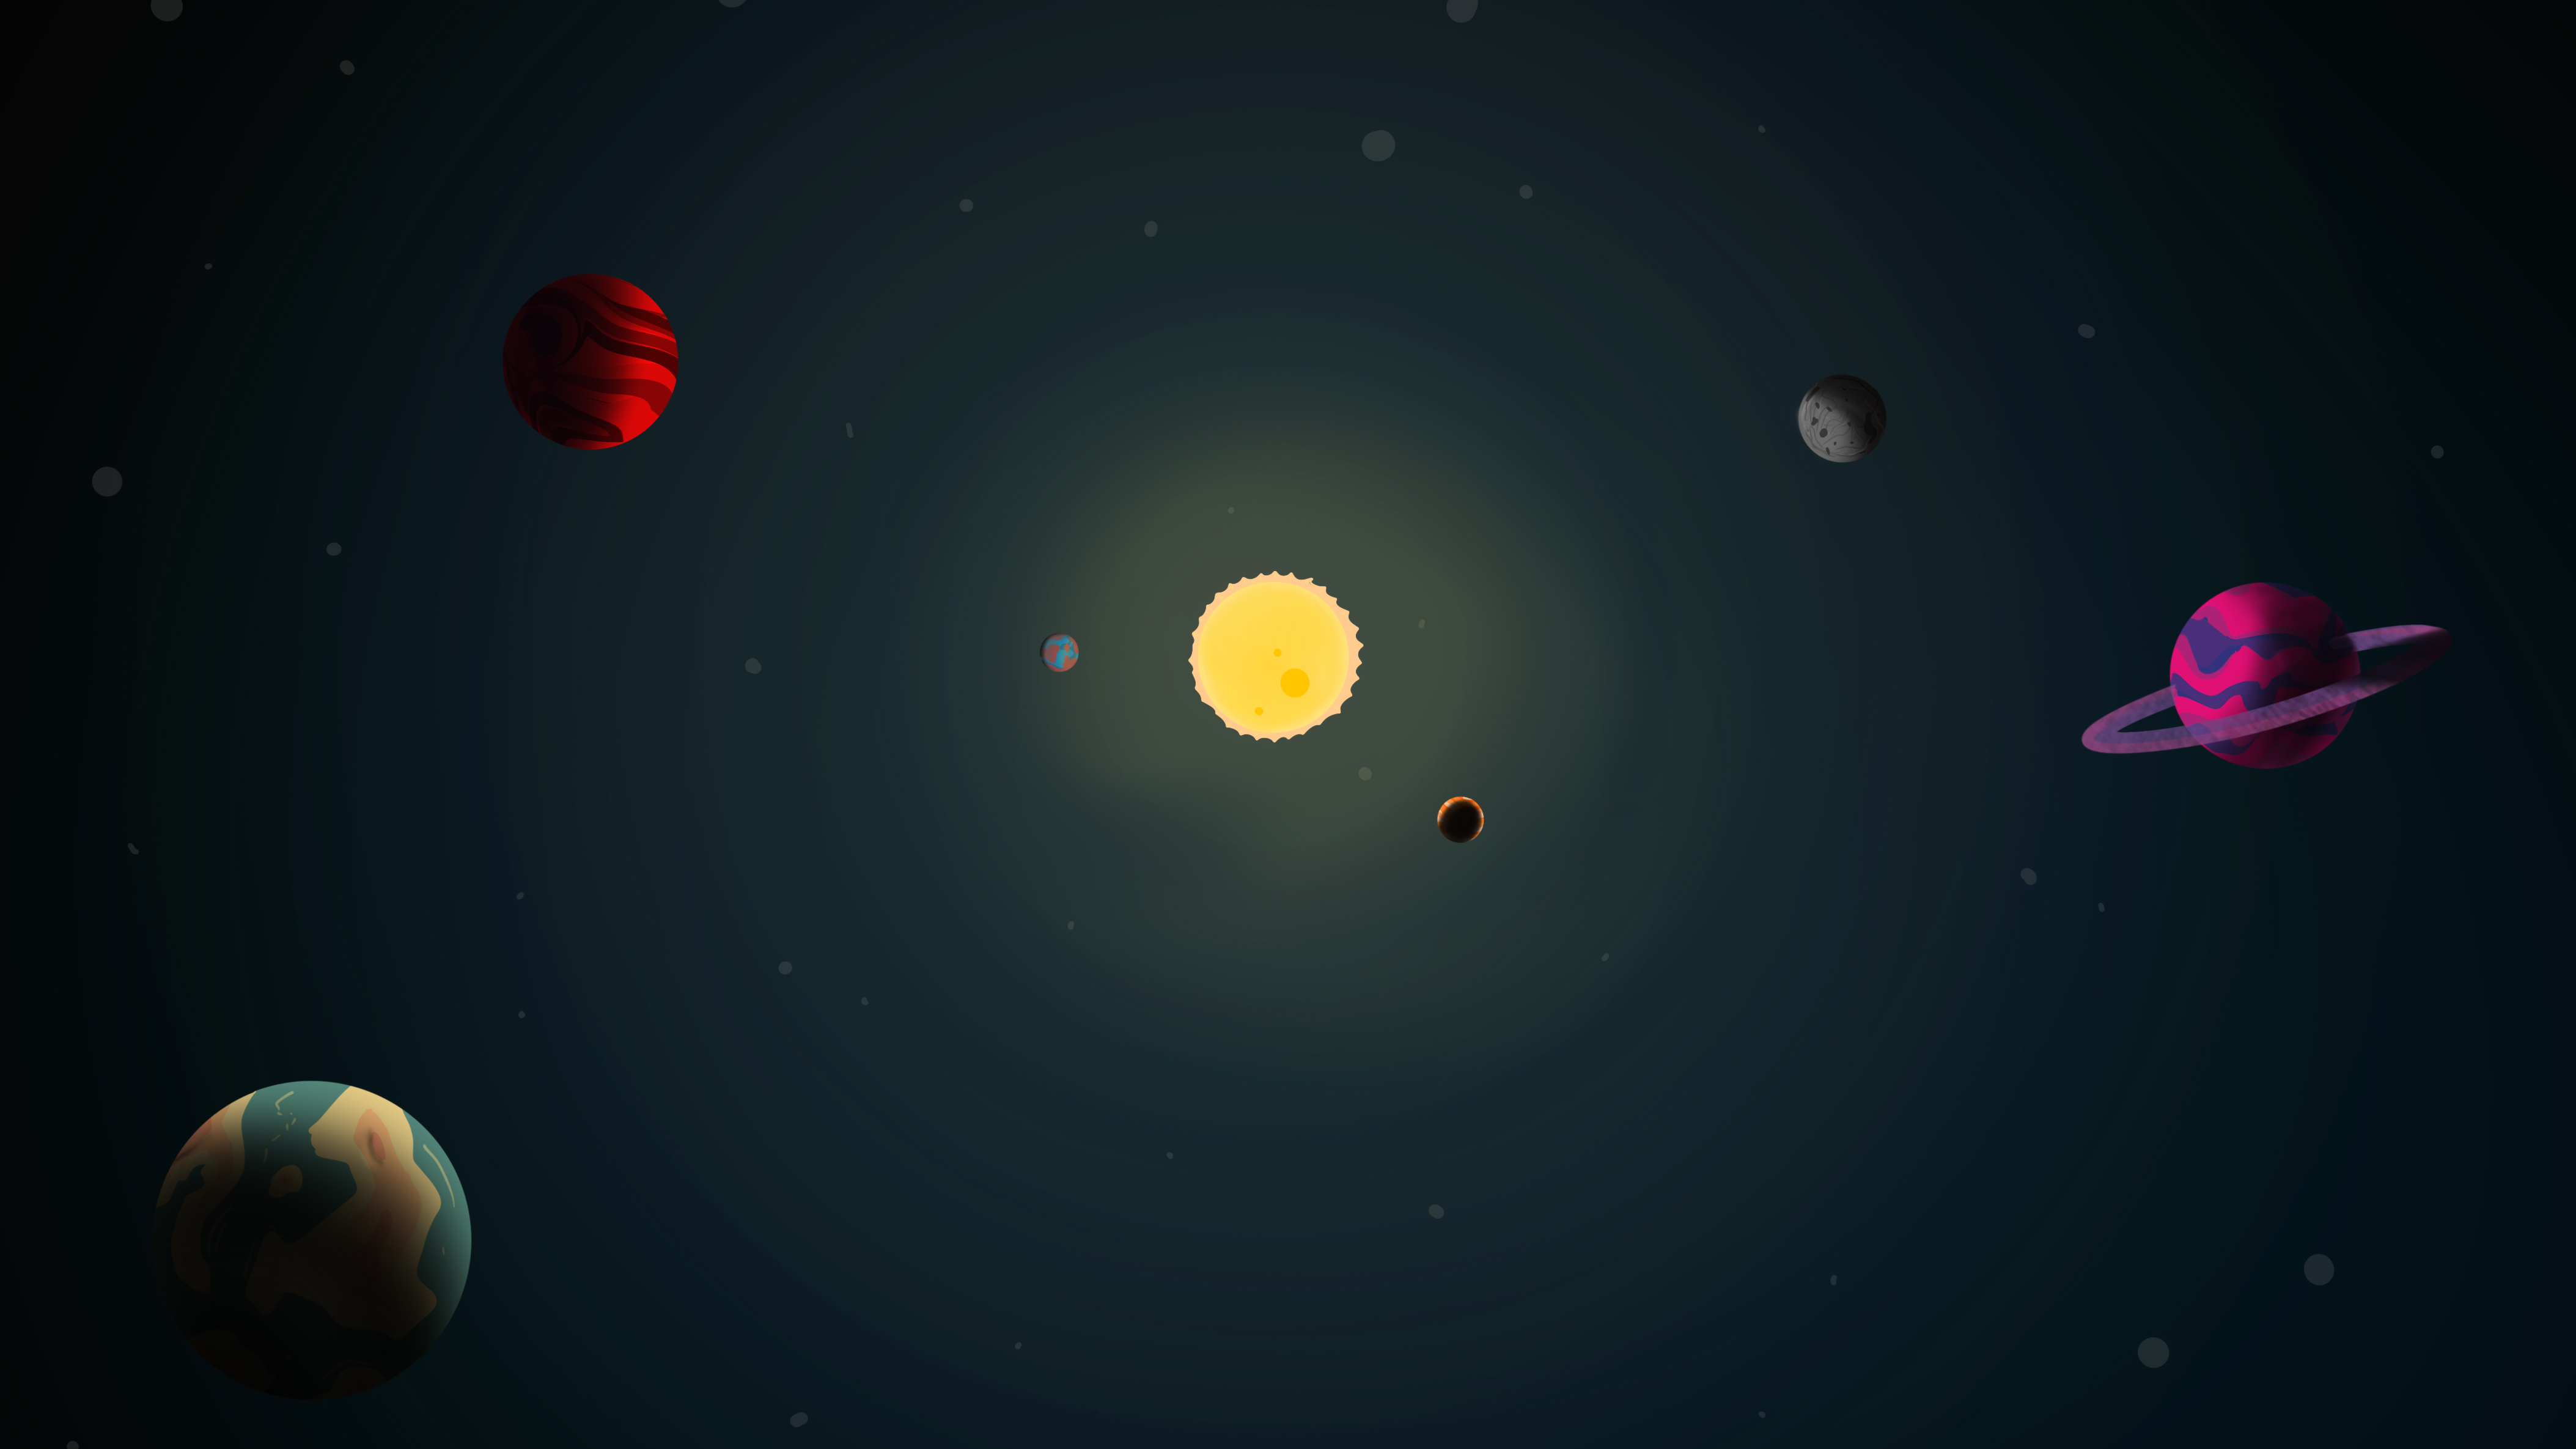 Fondos de pantalla Ilustración de planetas